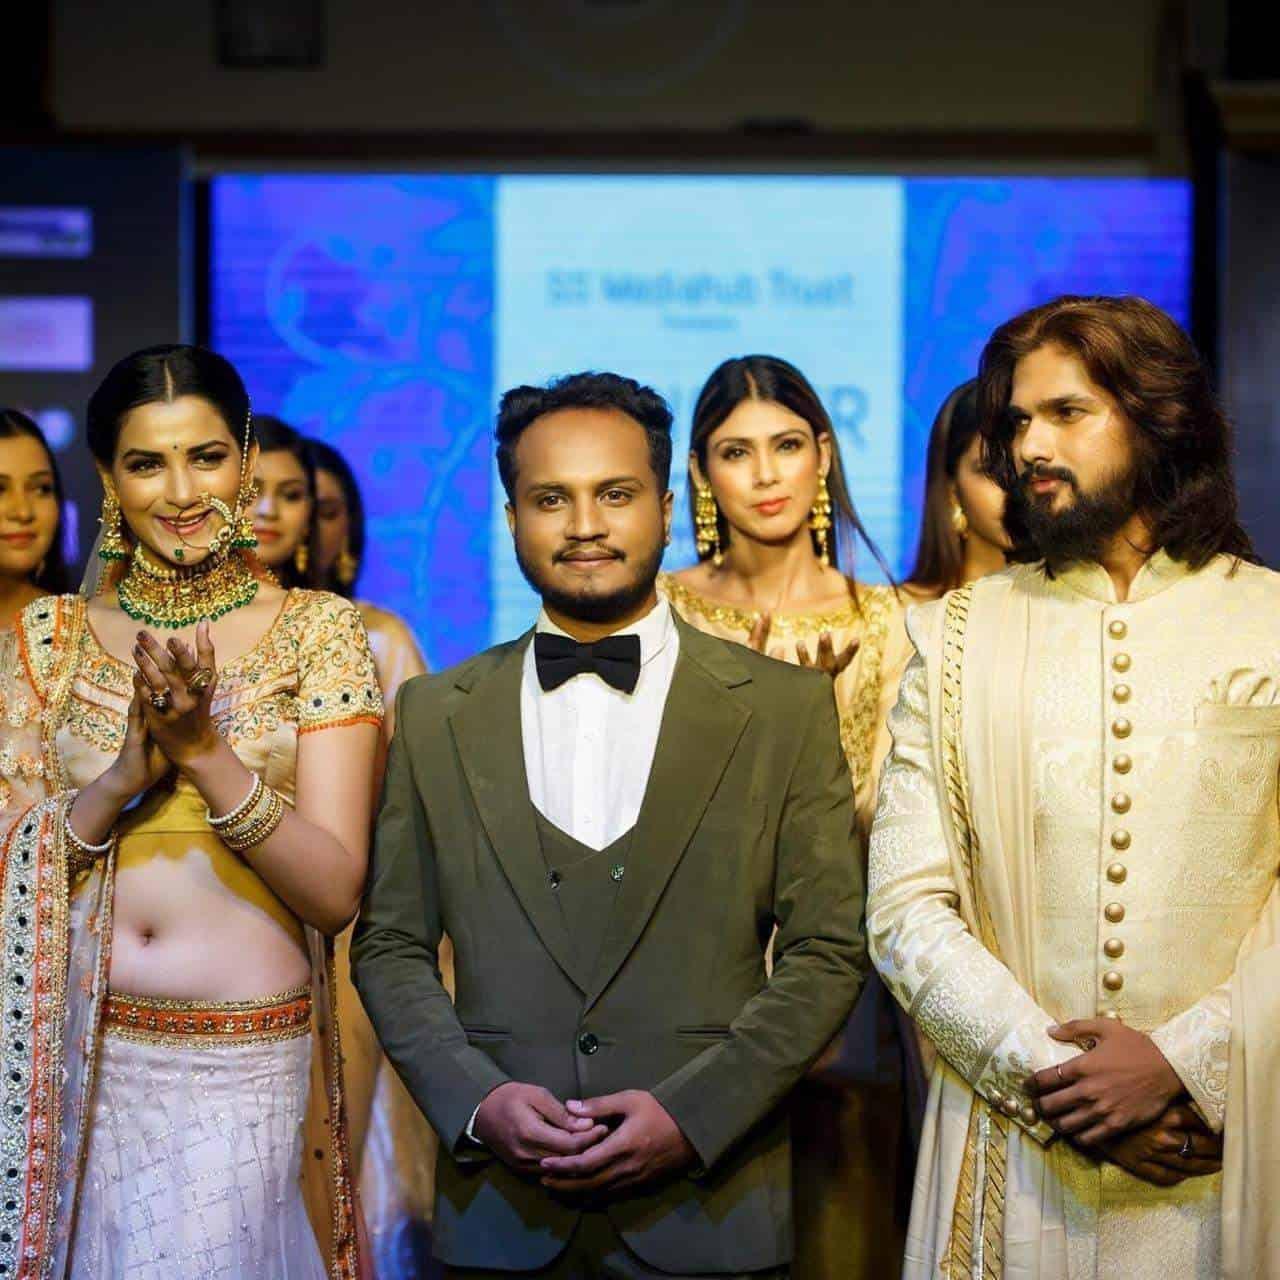 Riwaj Creations Chelipura Fashion Designers In Aurangabad Maharashtra Aurangabad Maharashtra Justdial